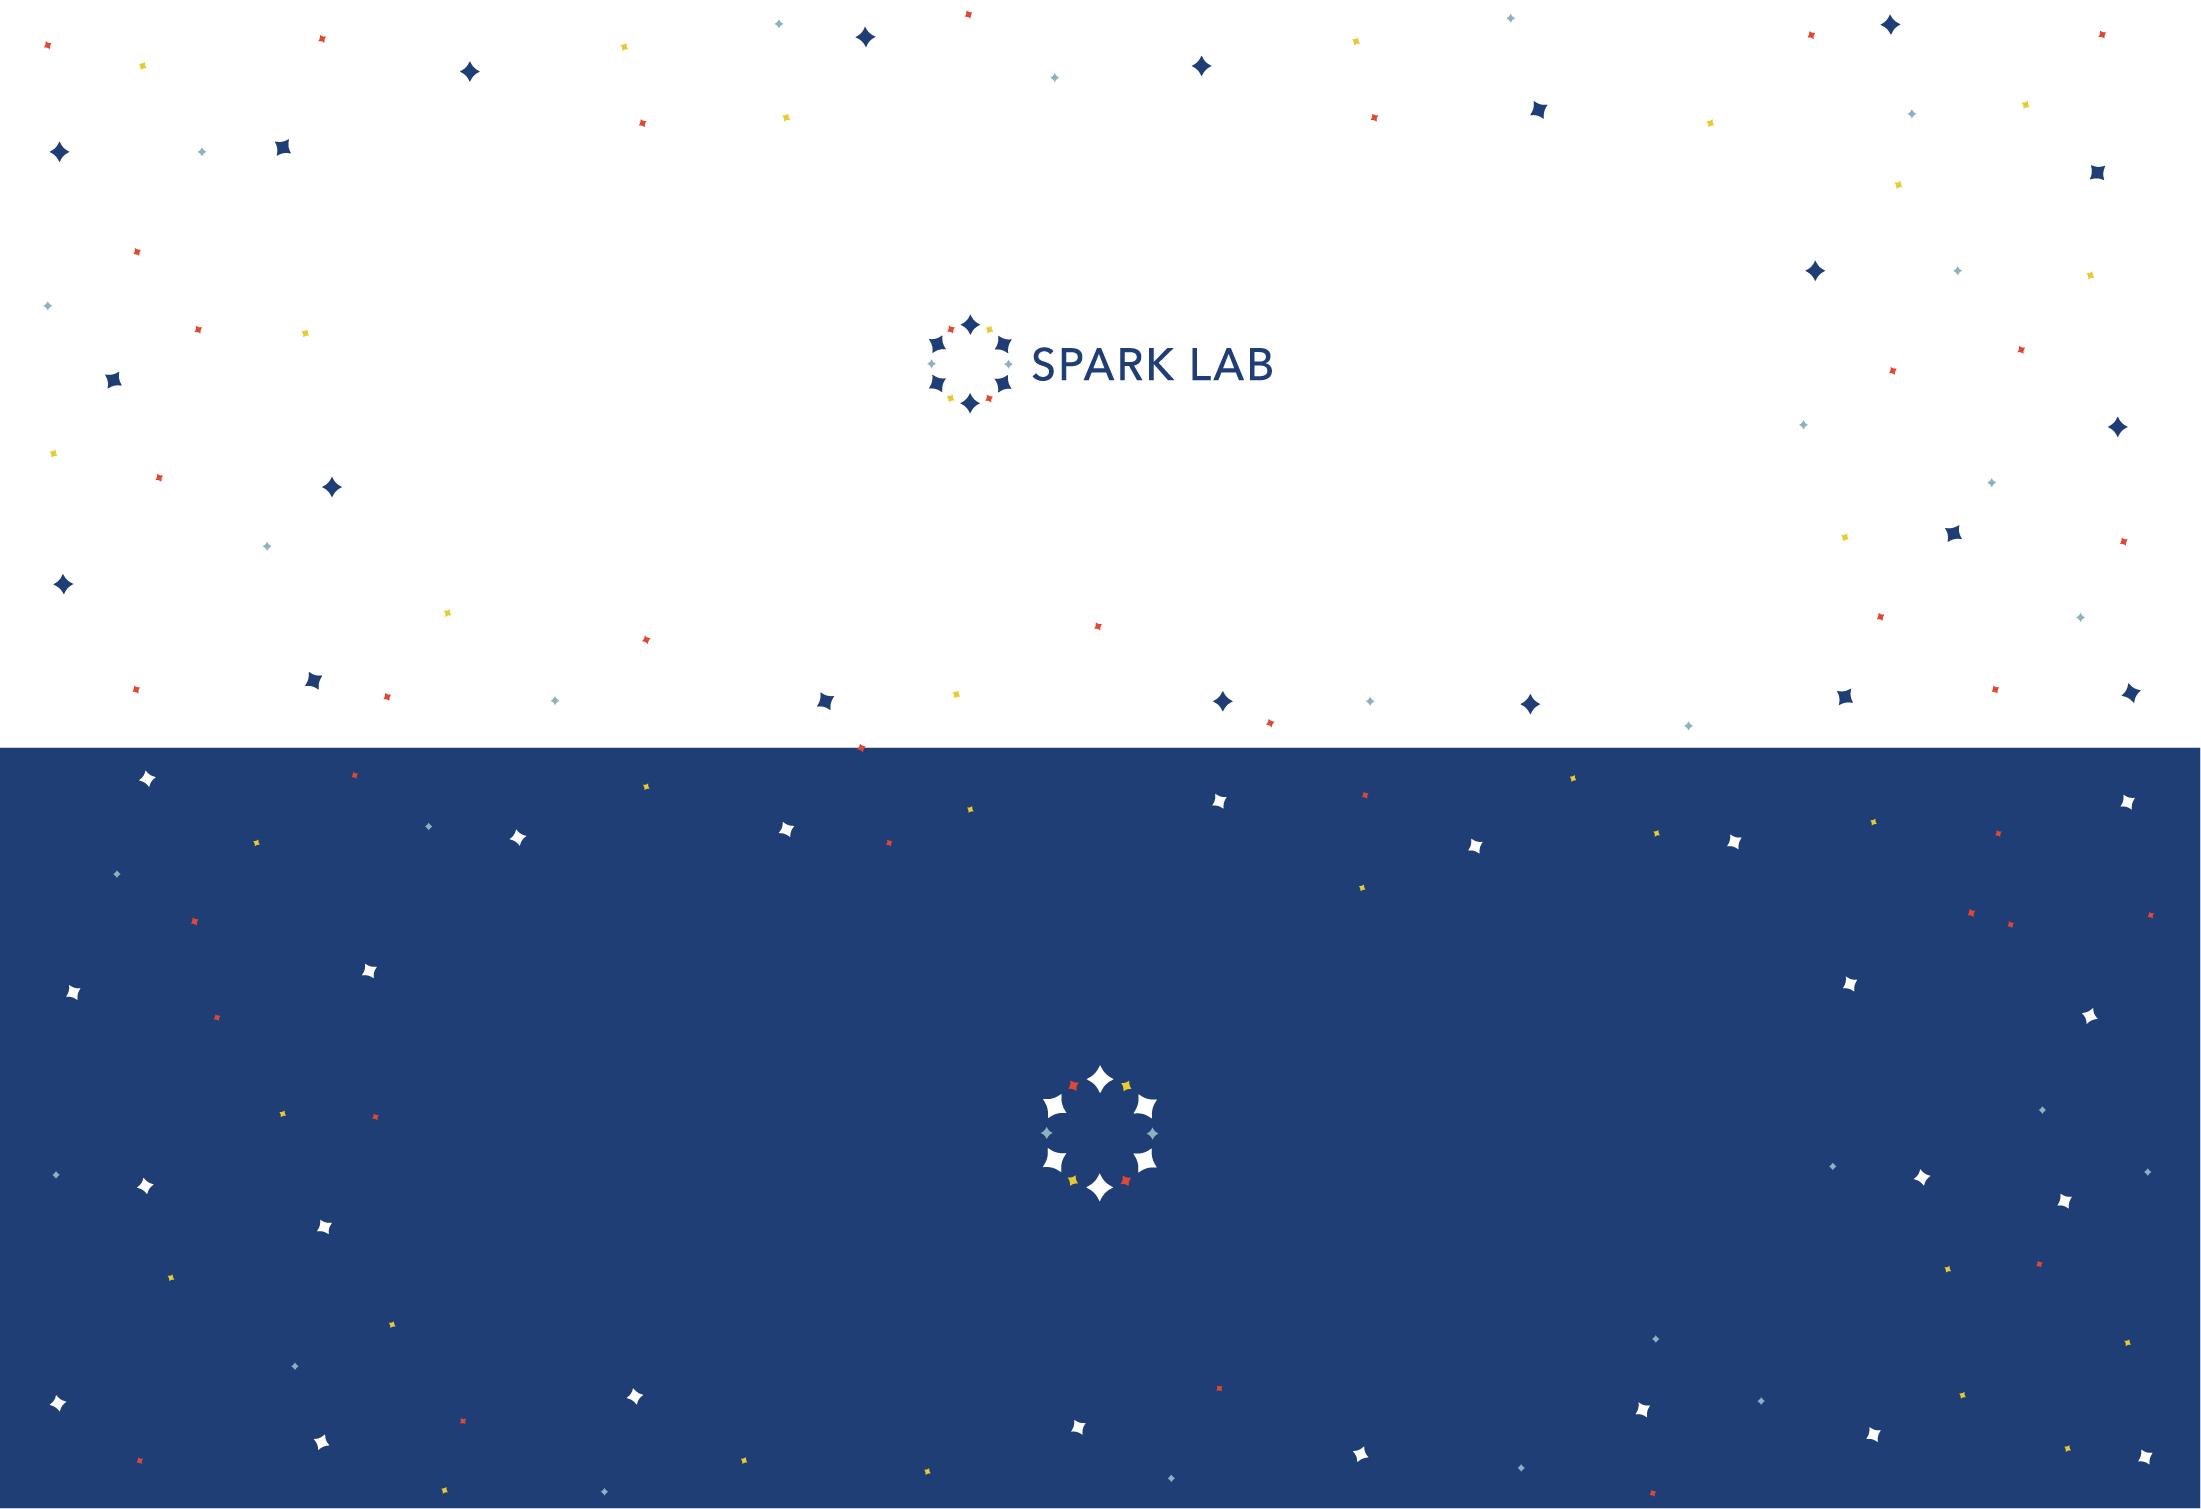 sparklab-logo-blue-white-30